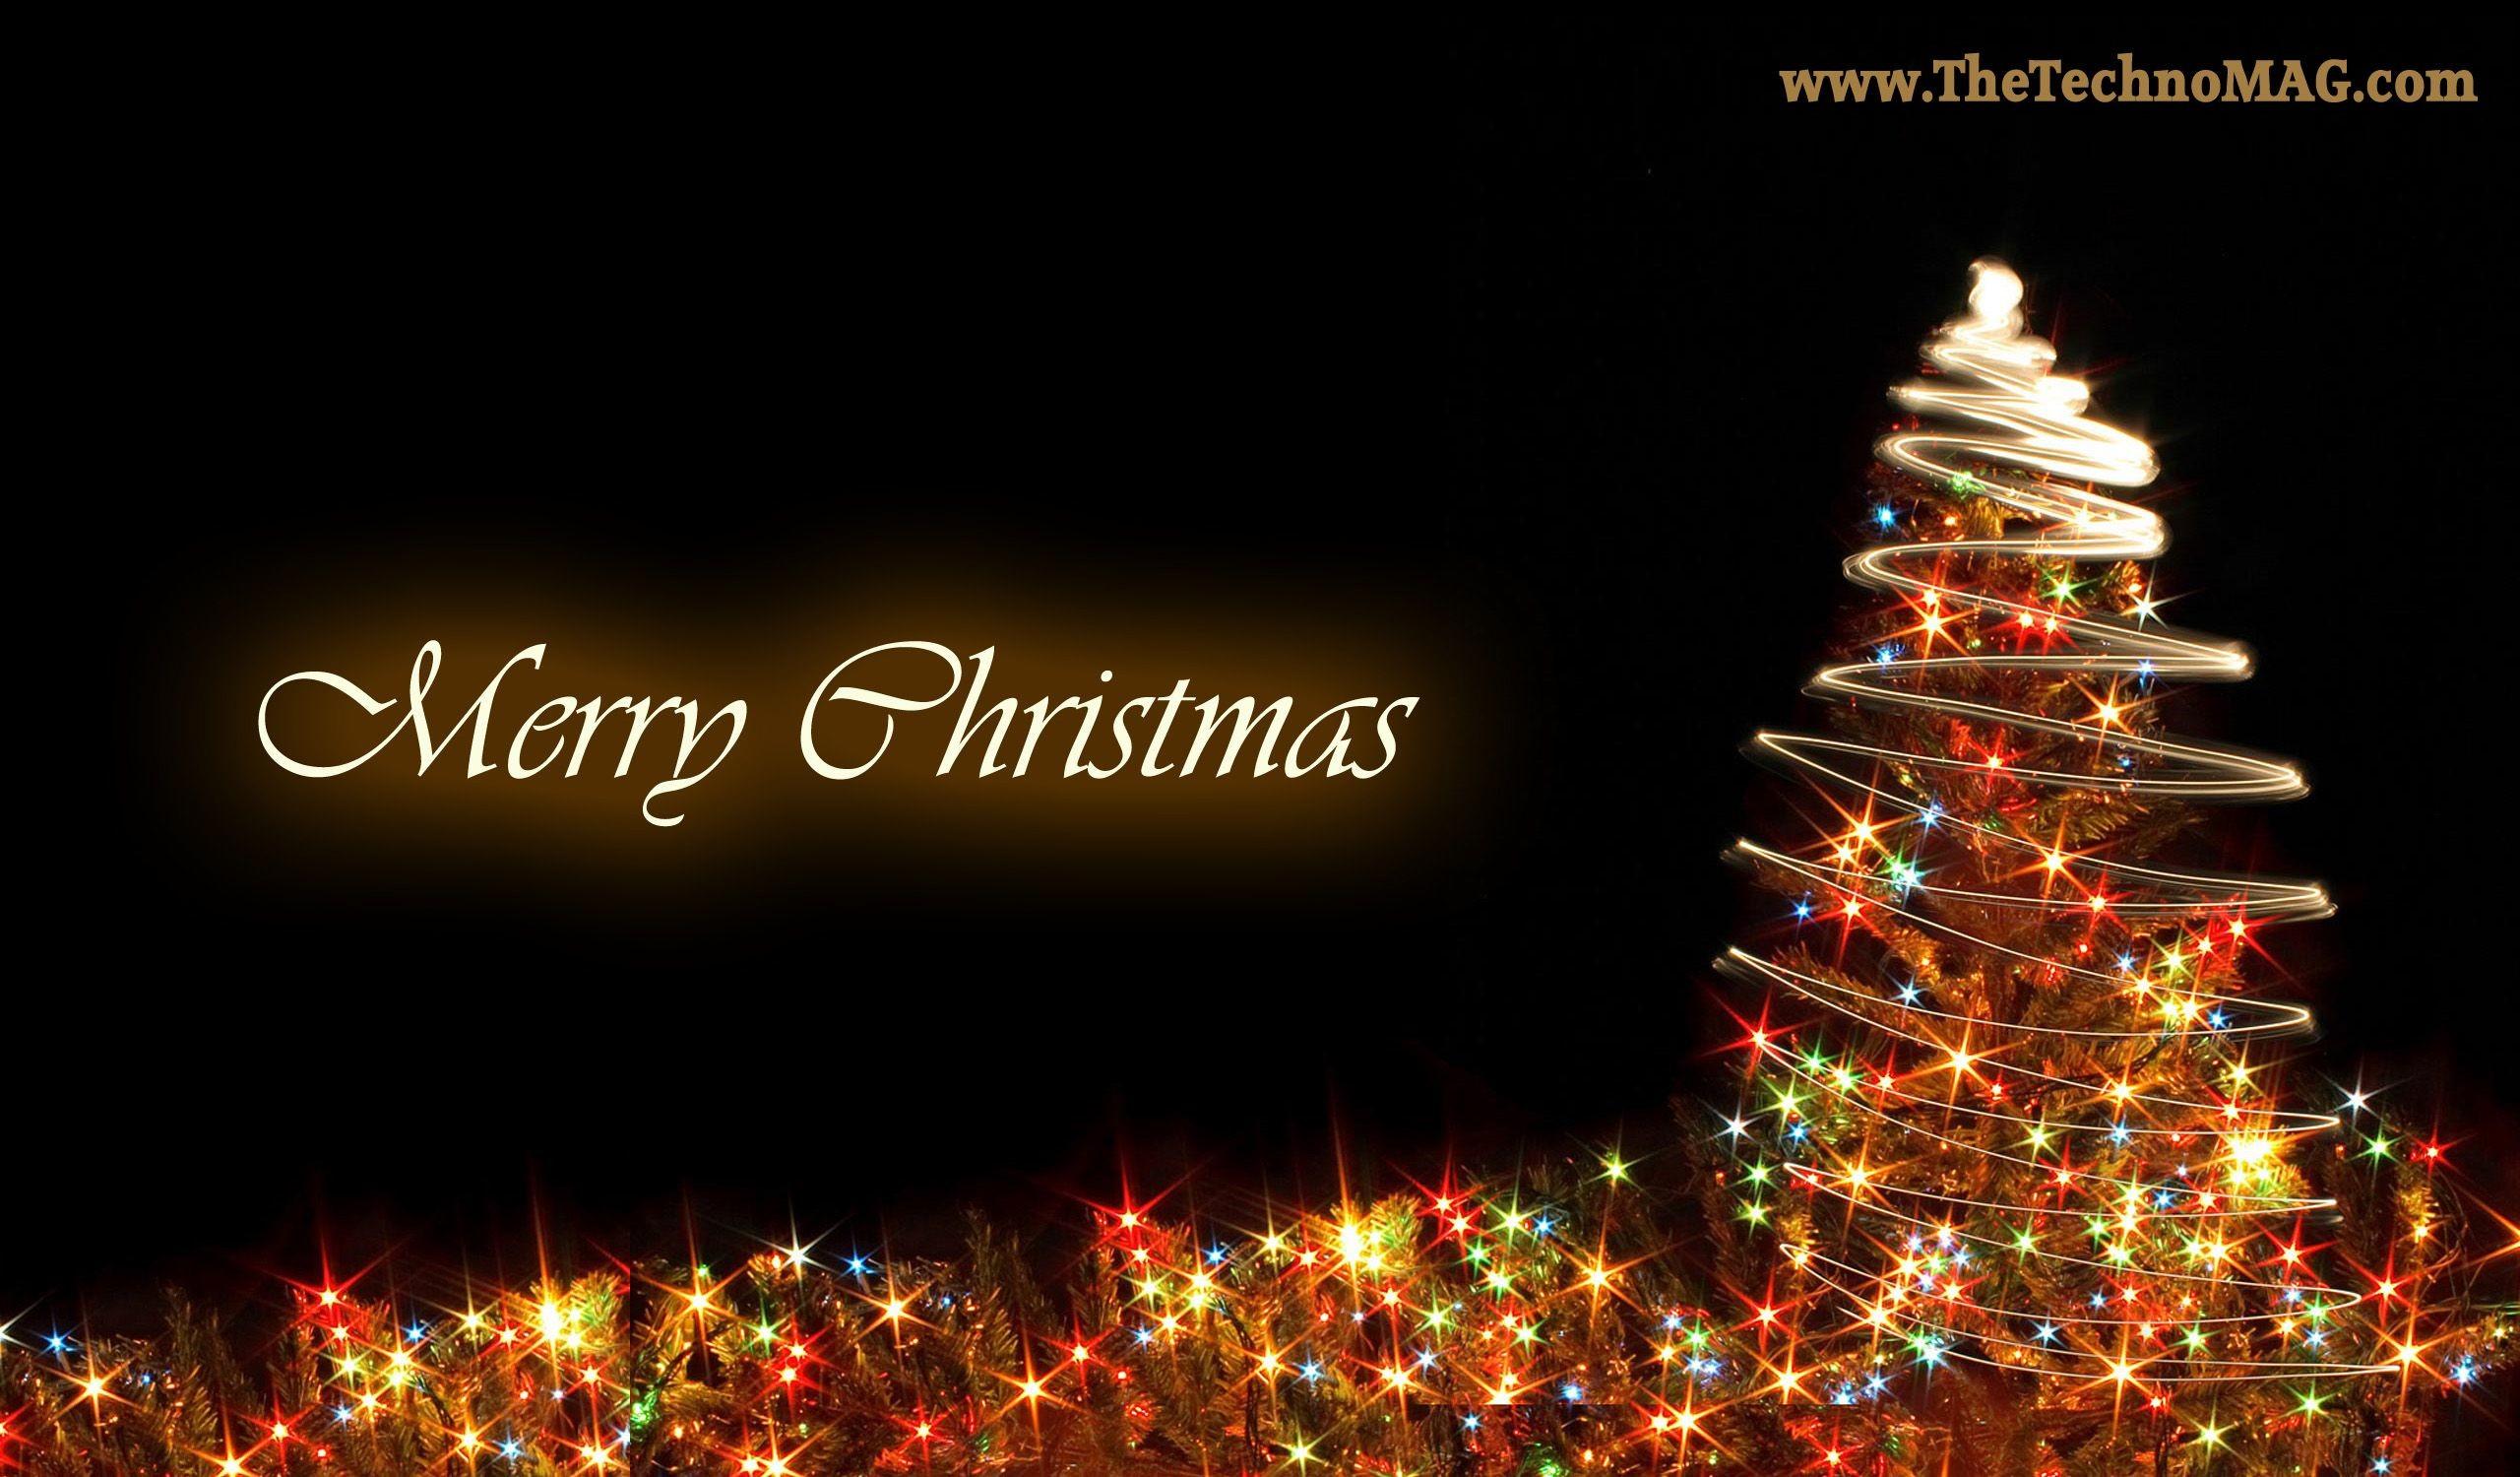 Download Wallpaper Home Screen Christmas - 520830  Photograph_334012.jpg